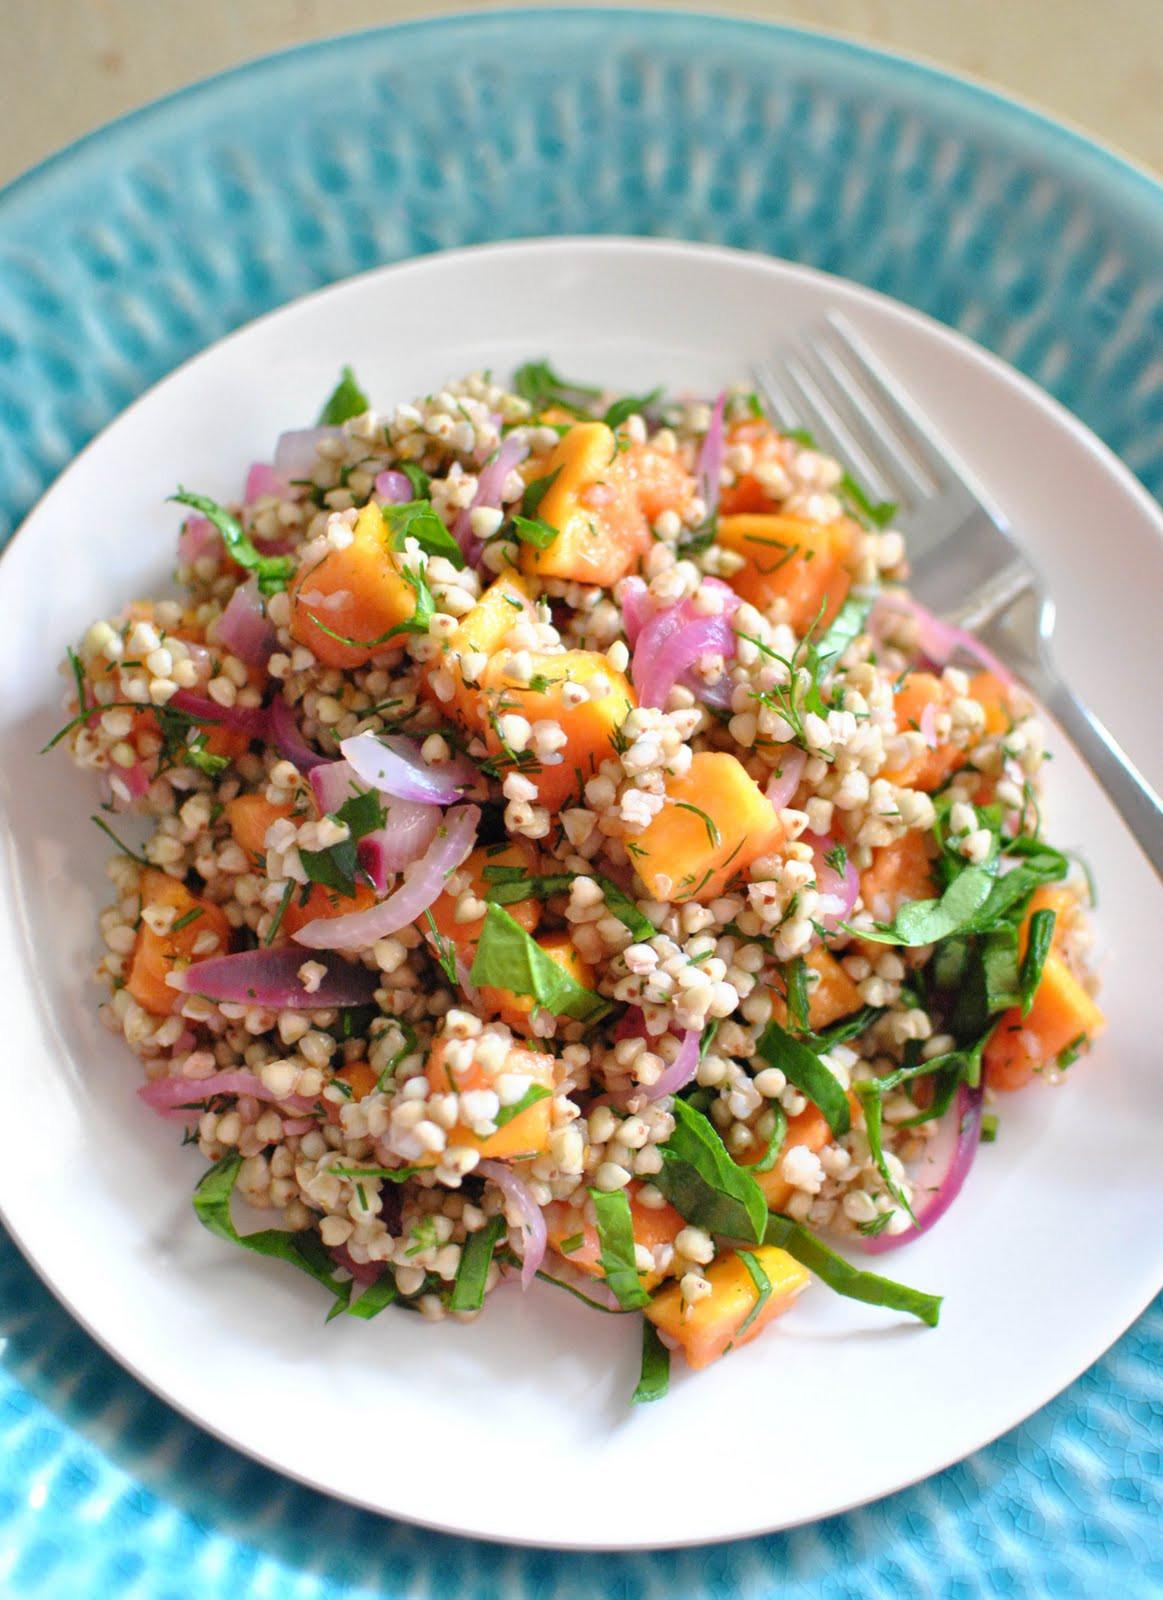 Super Healthy Salads  Scandi Home Rich Mineral Salad a k a Super Healthy Salad